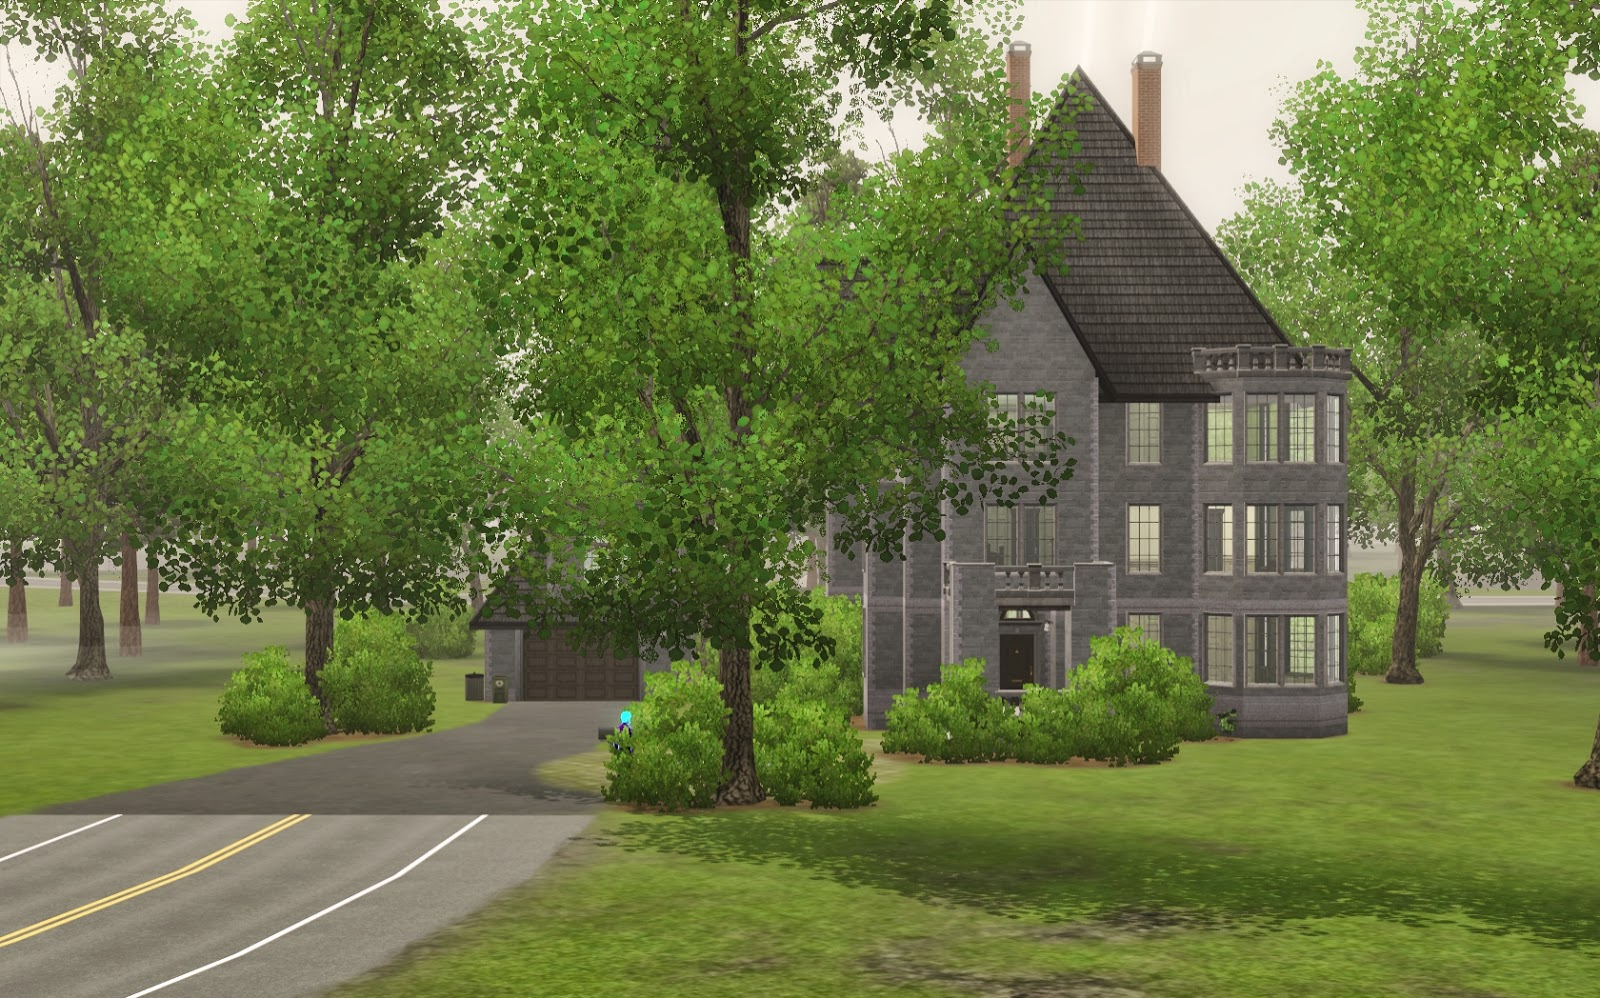 Summer's Little Sims 3 Garden: Moonlight Falls List of Houses